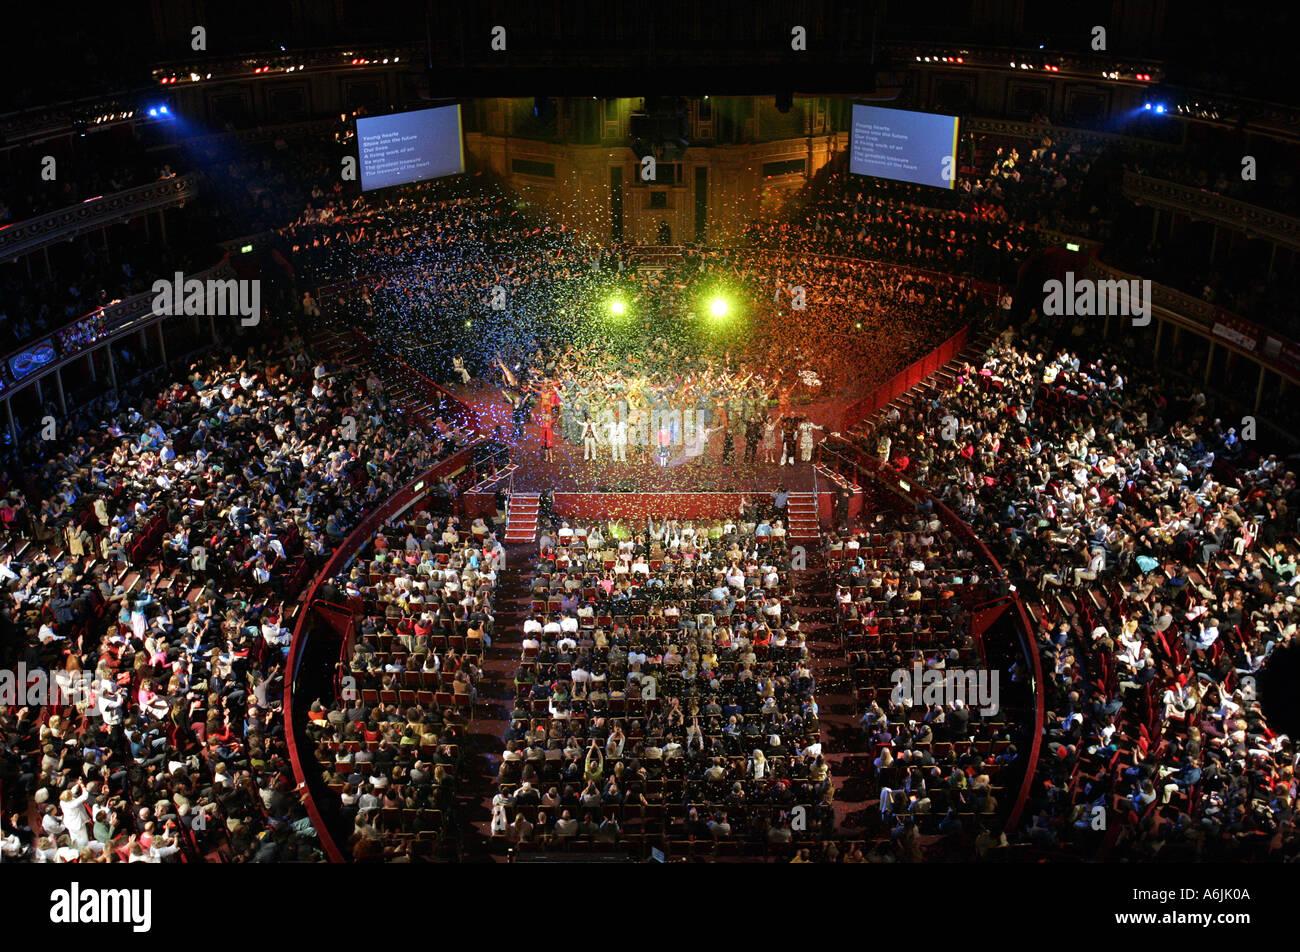 Soka Gakkai International Hauptversammlung Royal Albert Hall London England Großbritannien UK Stockbild